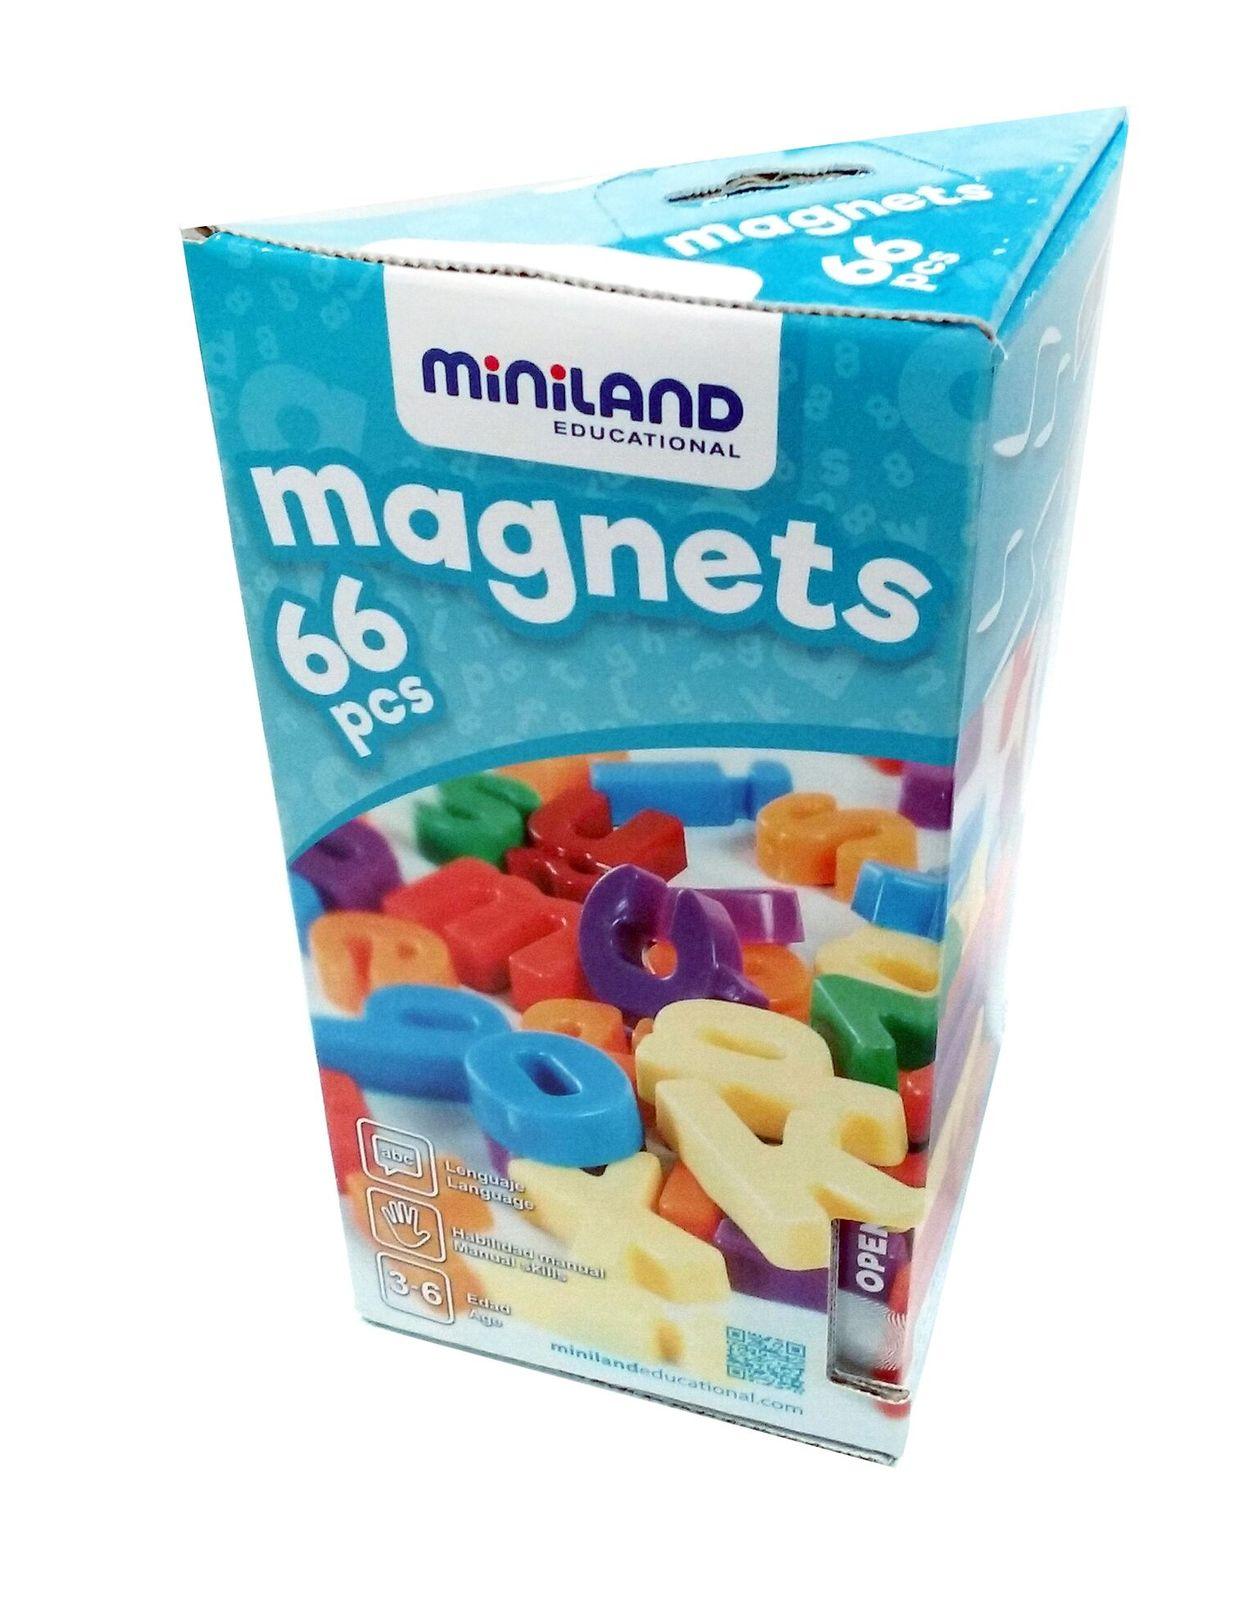 Miniland Magnetic Lower Case Letters, (62 pcs) image